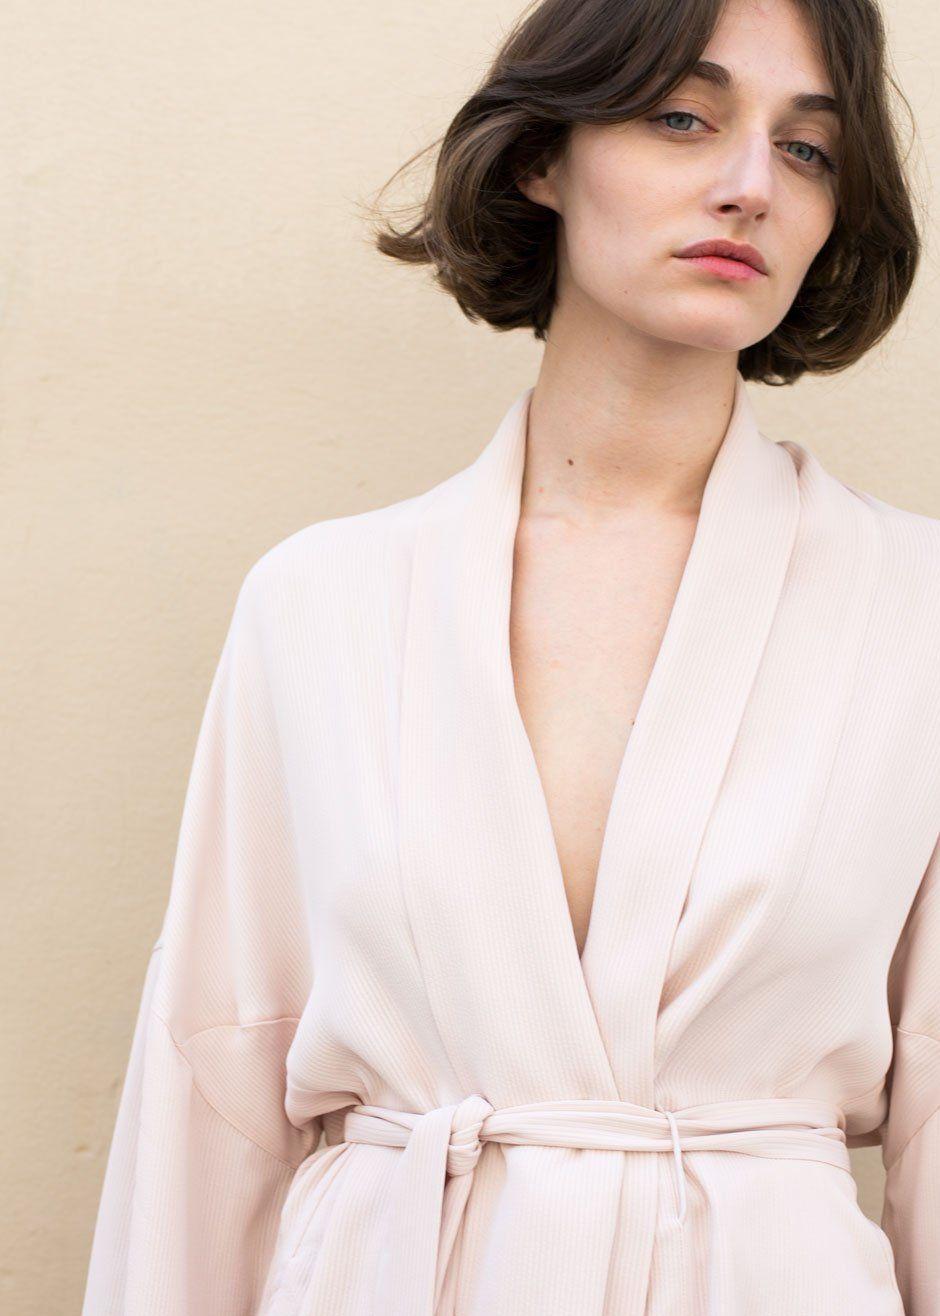 75a10dfca5  Rodebjer  Pink  Sand  Anahi  Viscose  Kimono  Jacket  Thefrankieshop   frankiegirl Rodebjer Pink Sand Anahi Kimono Blazer – The Frankie Shop